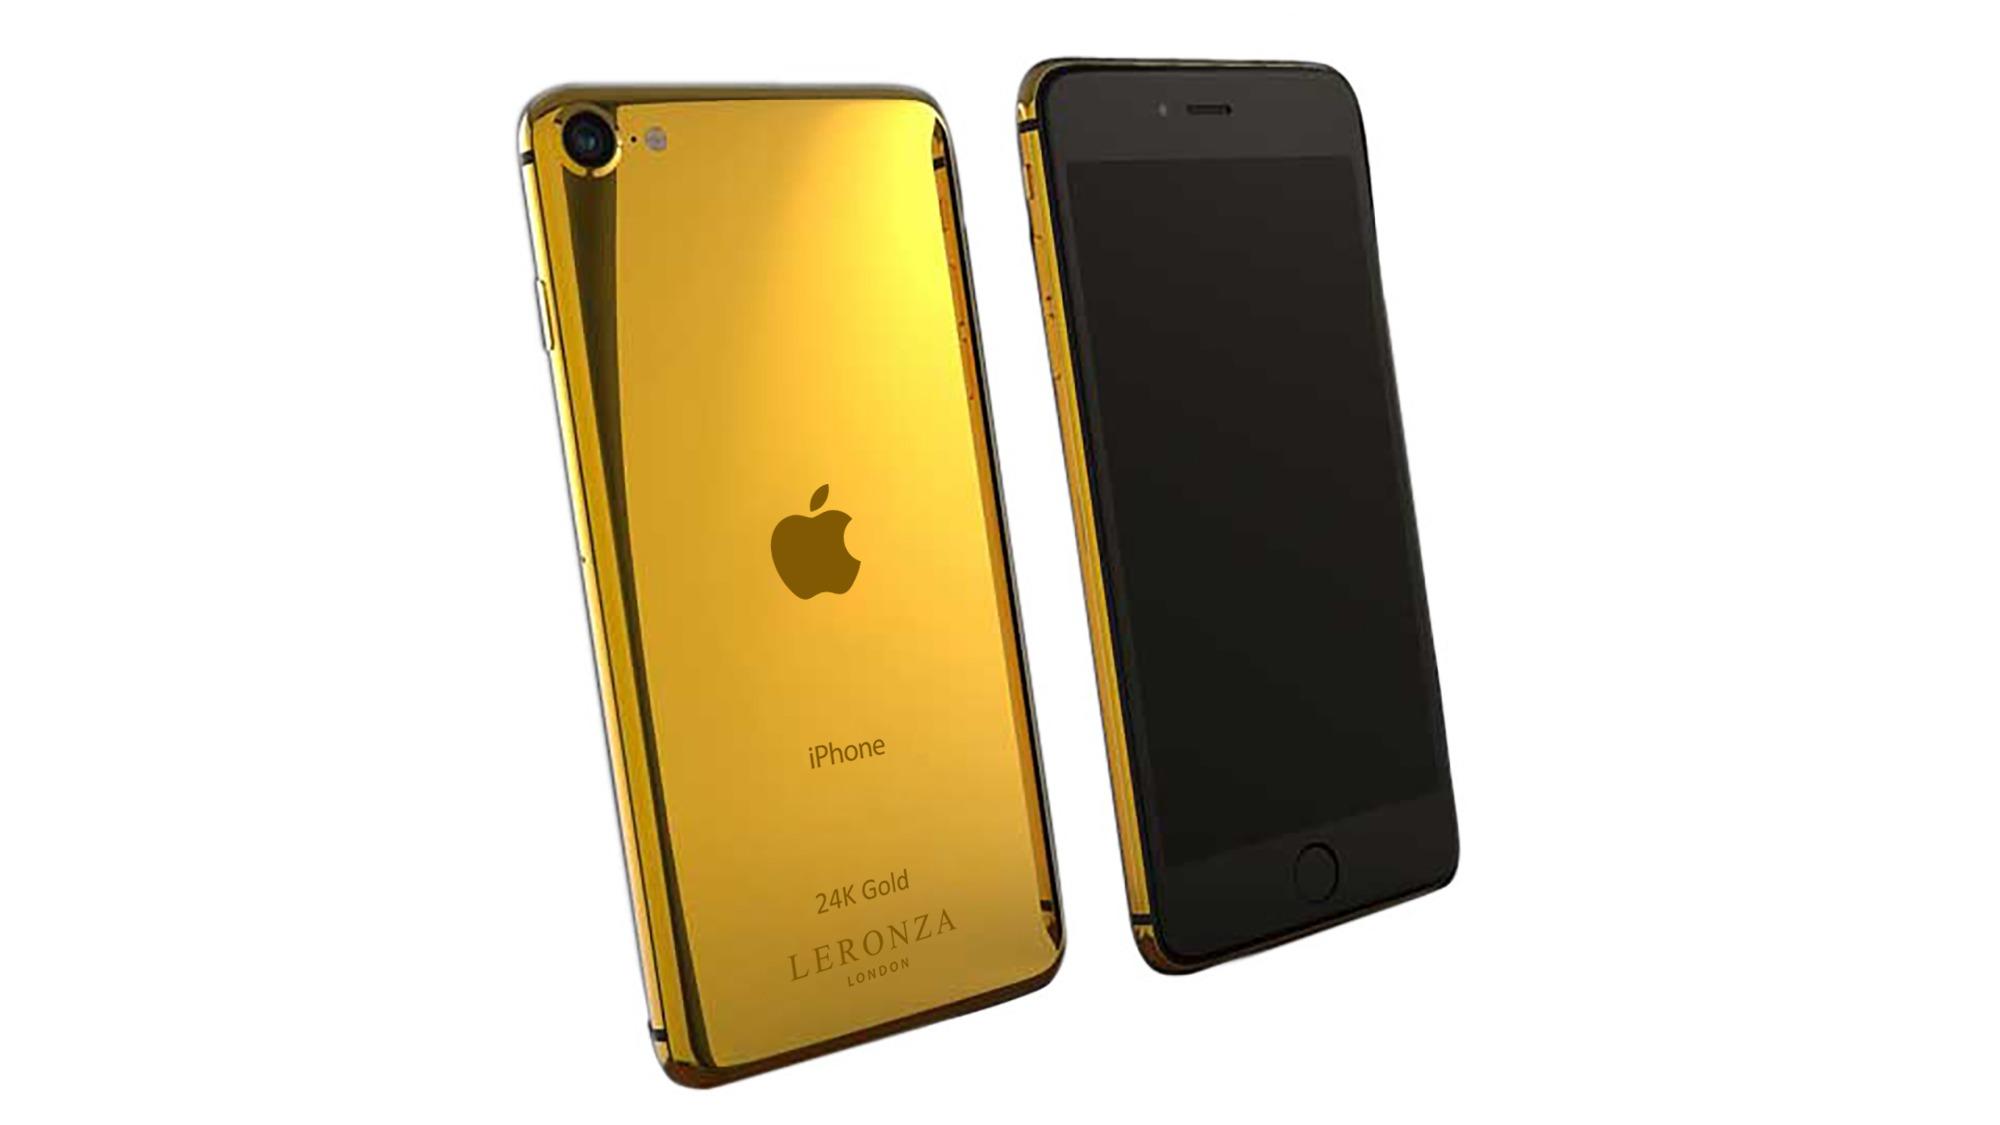 Luxury 24k Gold iPhone SE Elite - Leronza